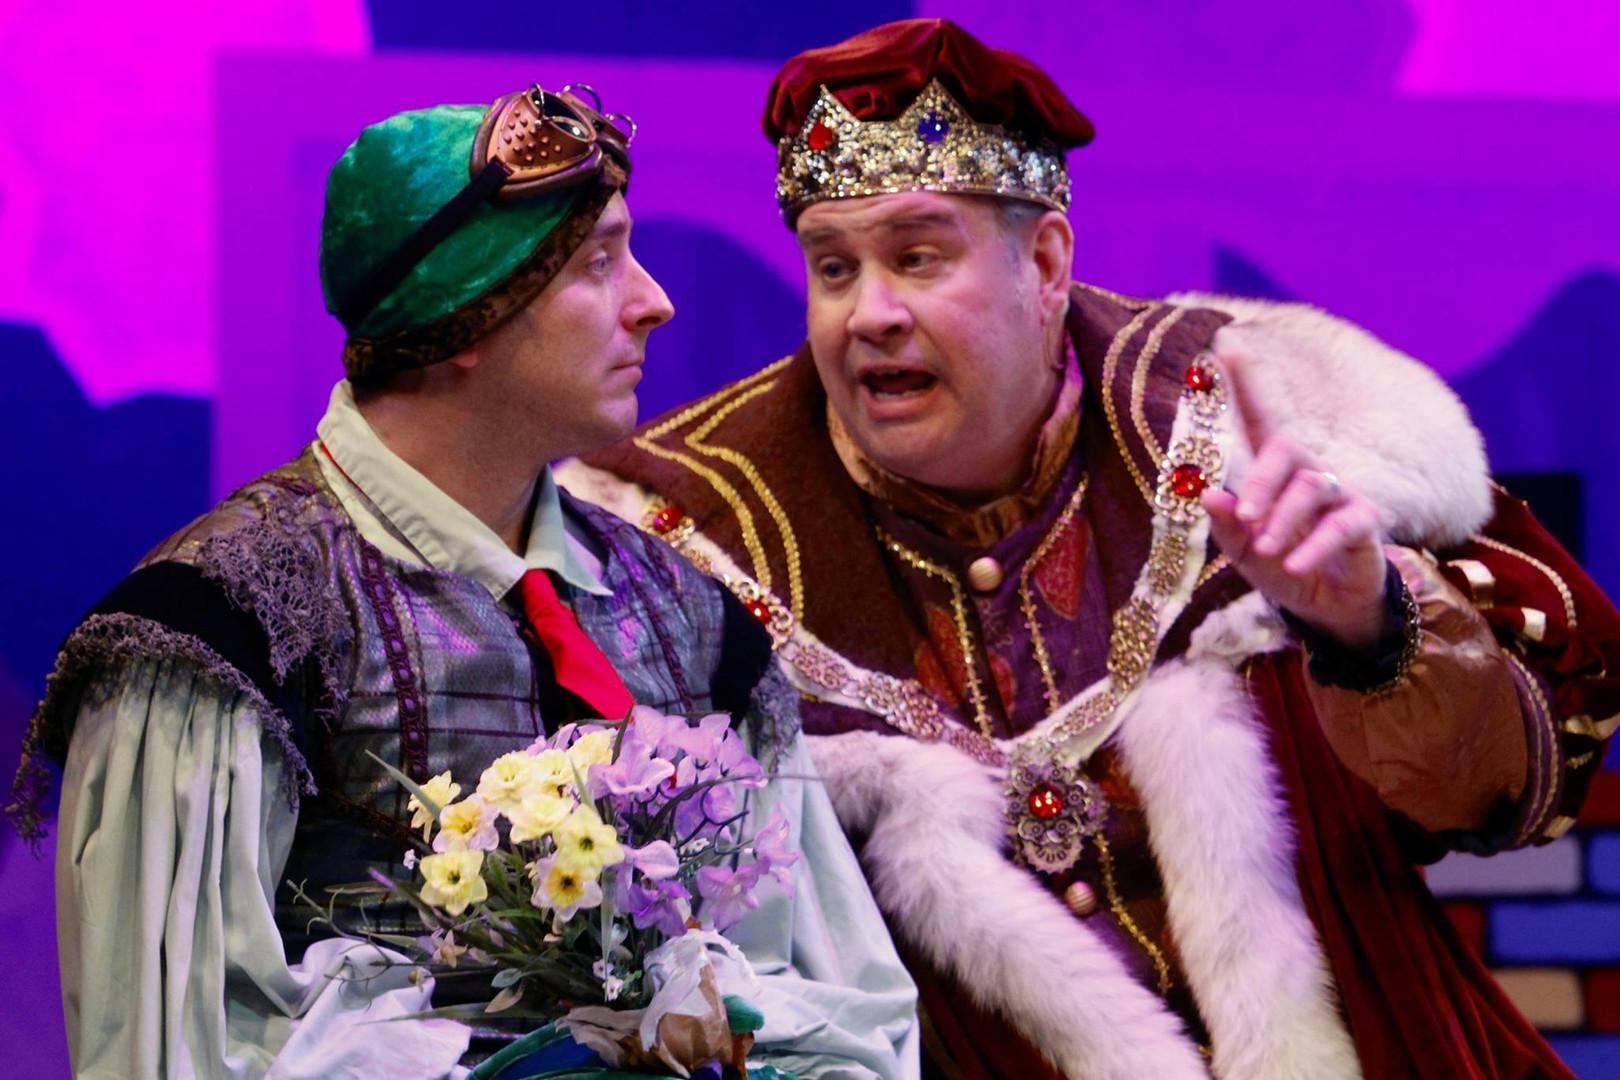 Alexander Sapp (Croaker) and Mark Persinger (King Arnold), Virginia Repertory Theatre.  Photo by Jay Paul.